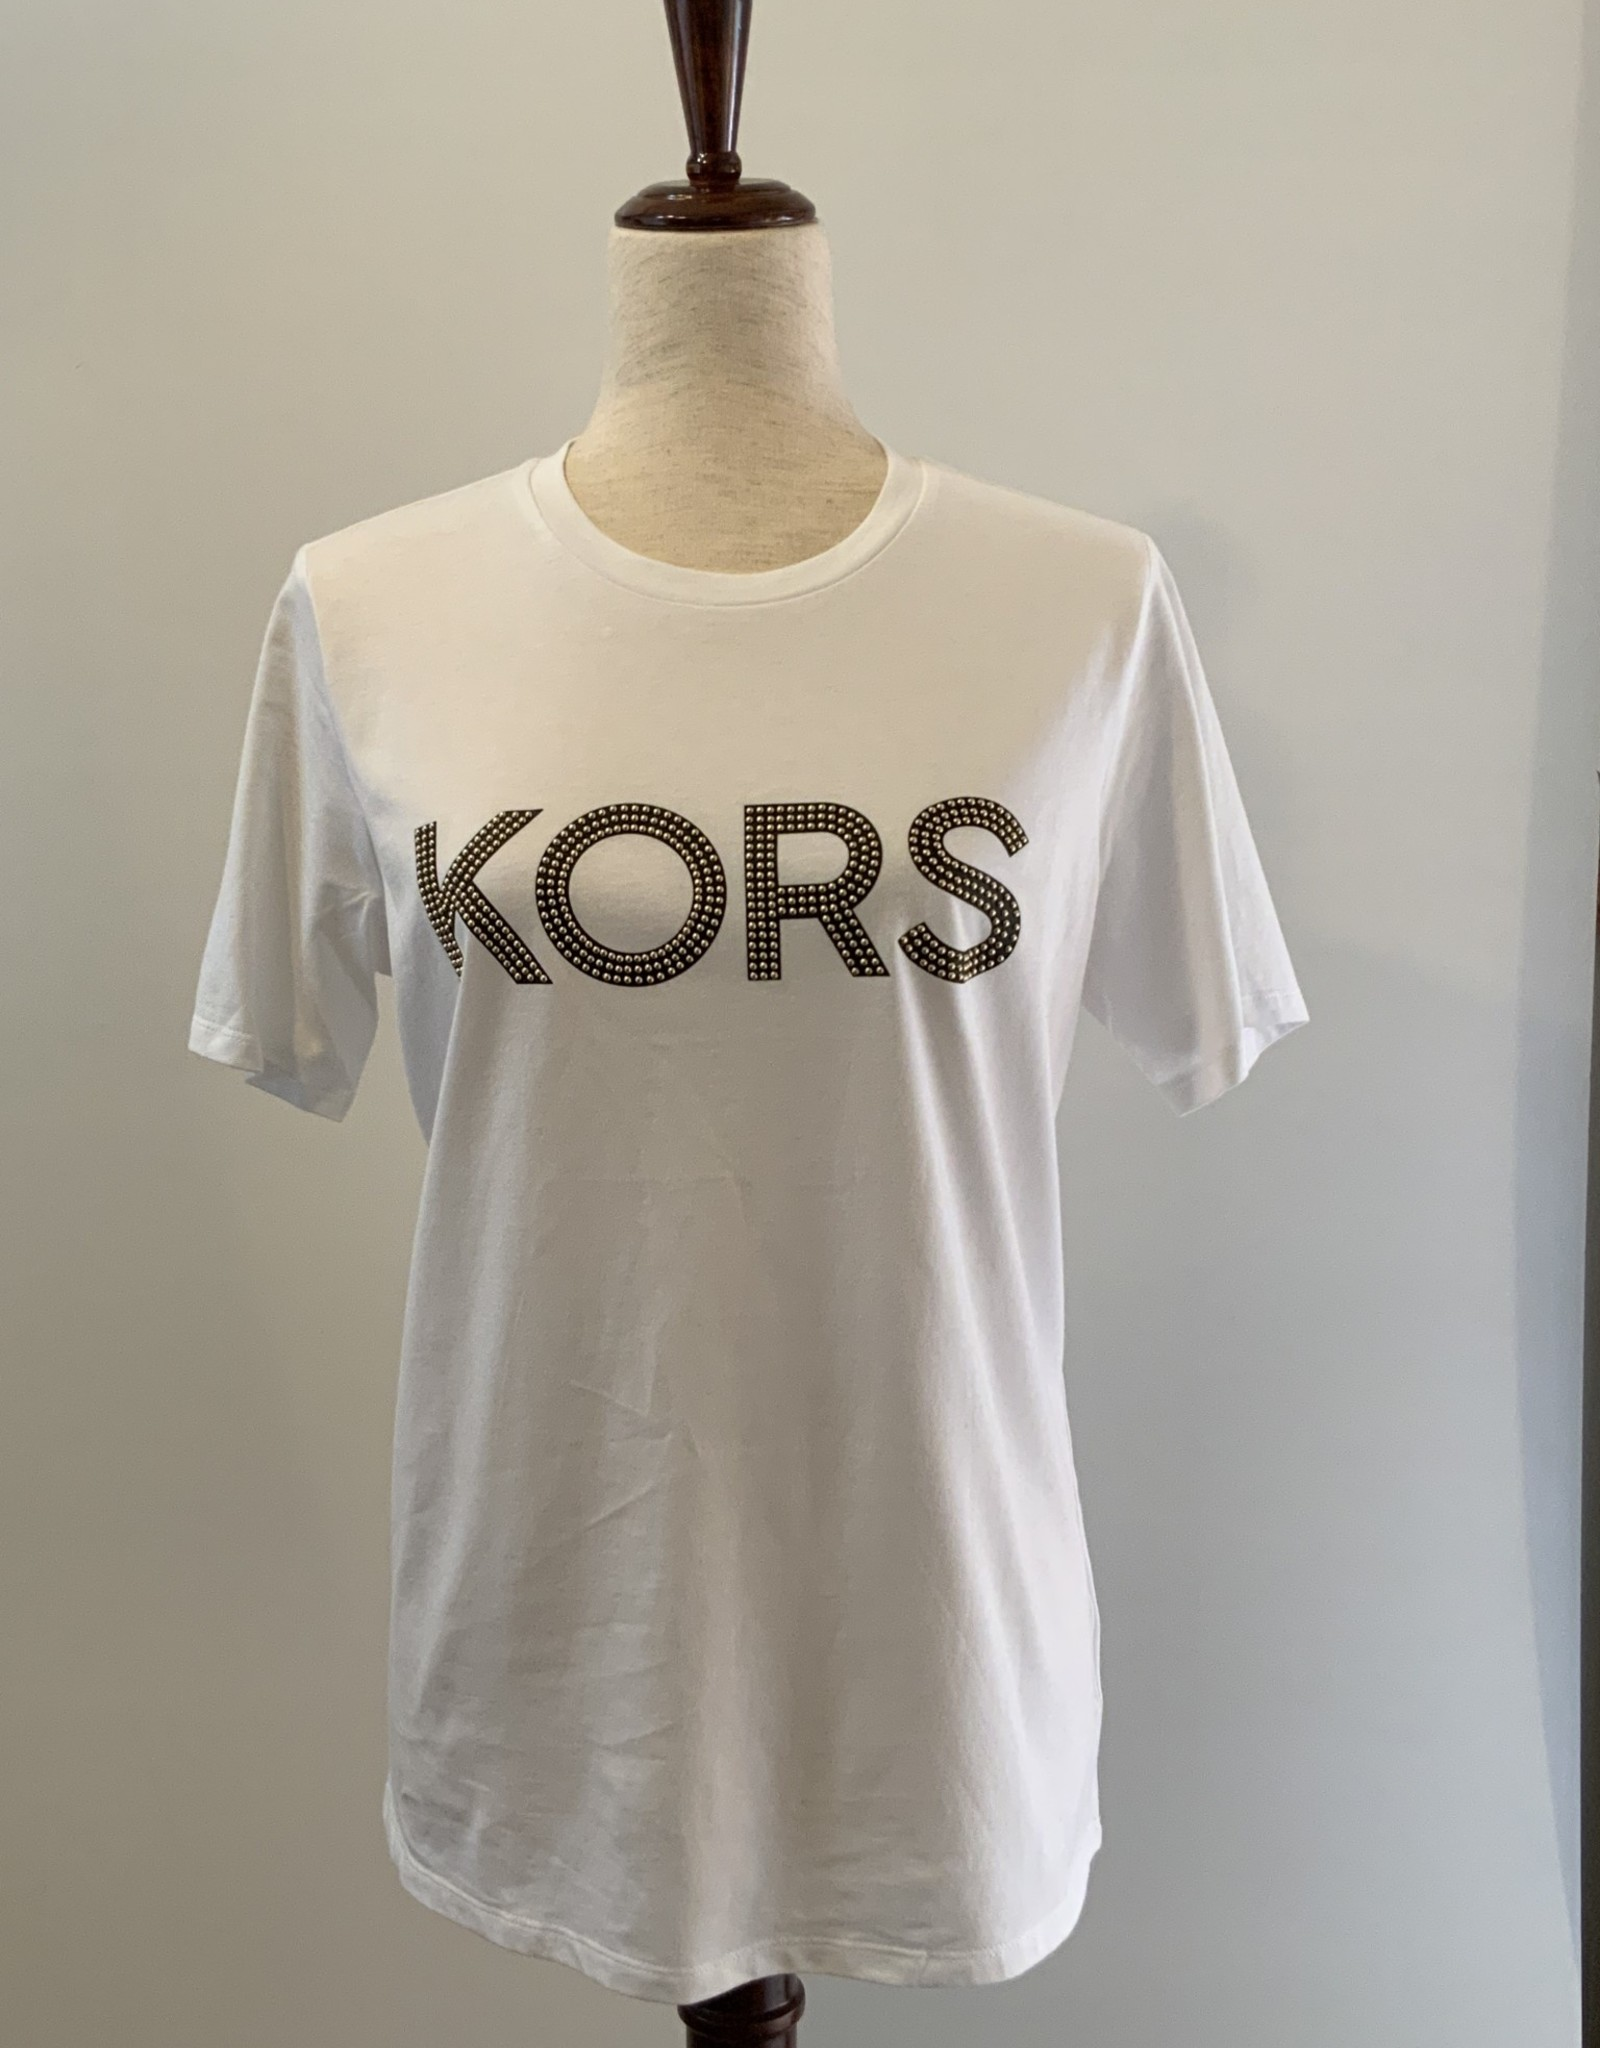 Michael Kors Michael Kors Tee Kors Logo Studs